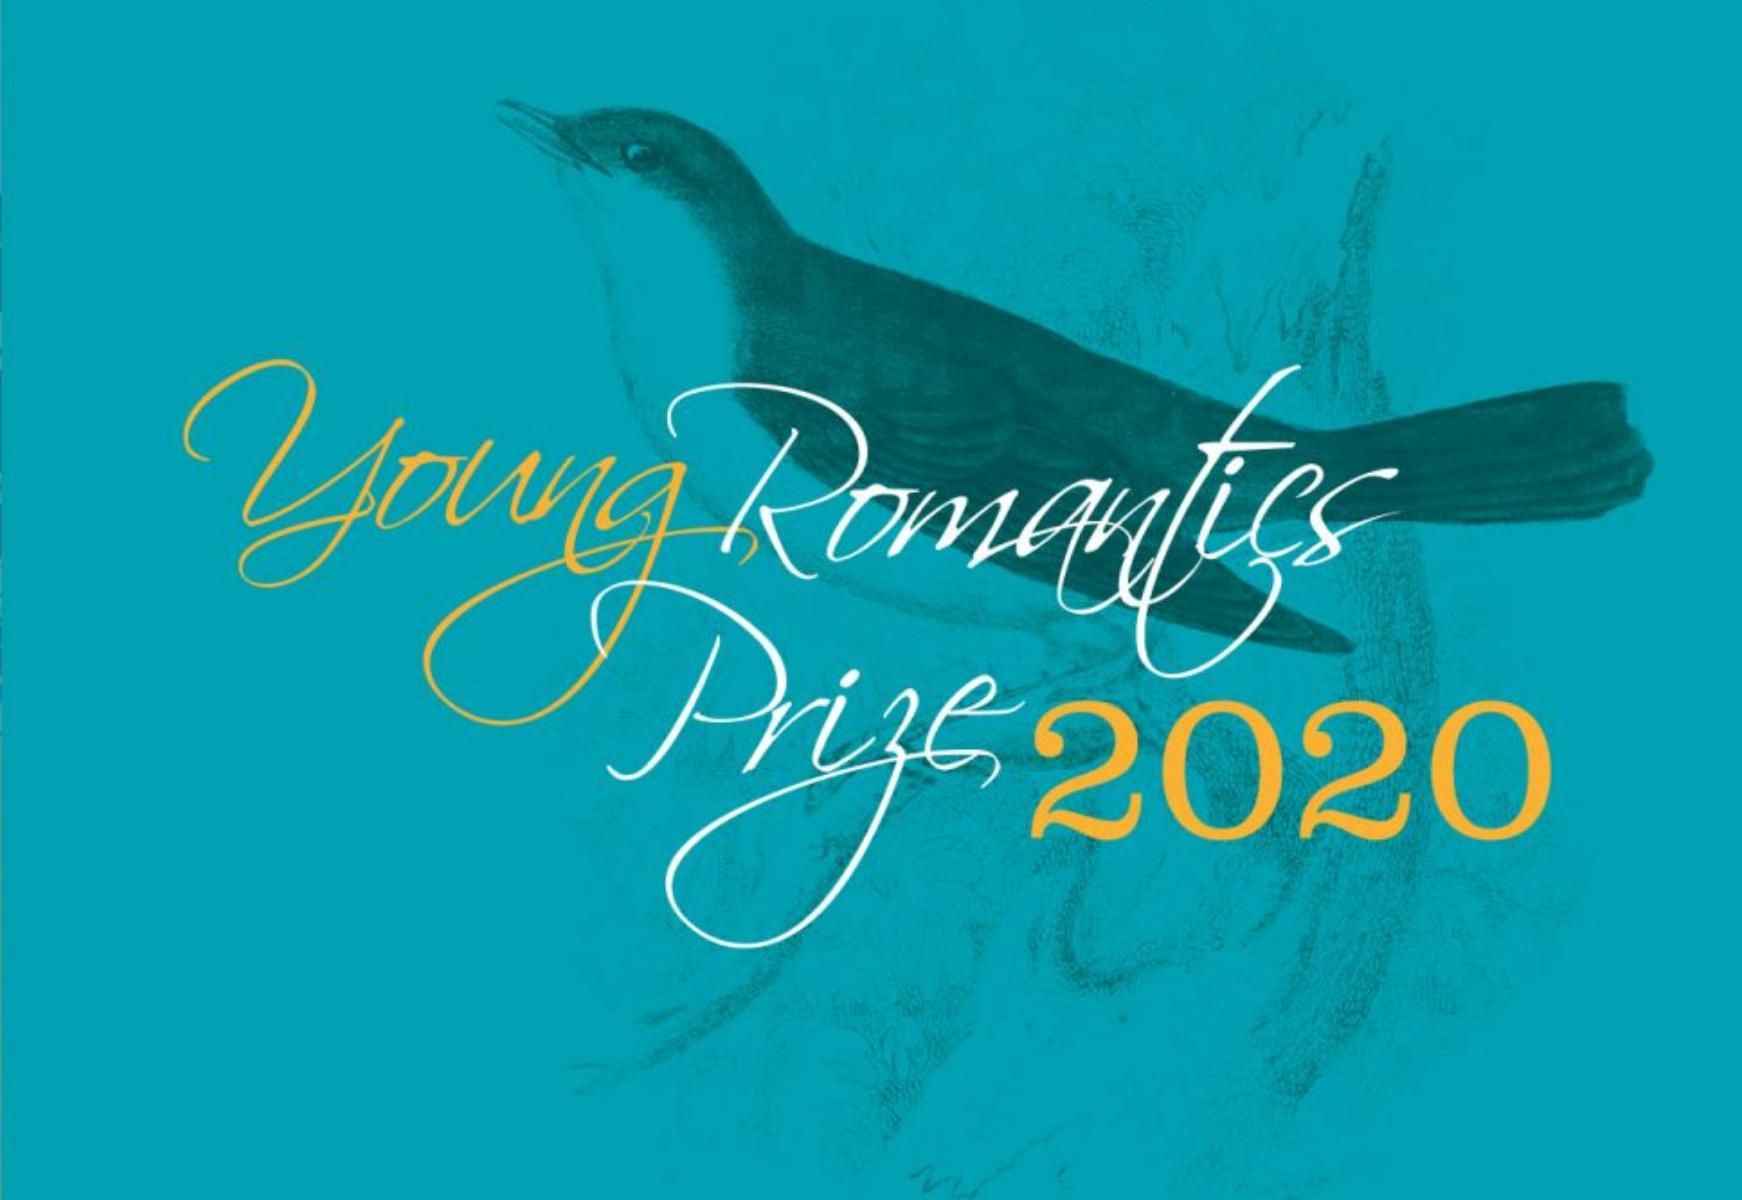 Young Romantics Prize 2020